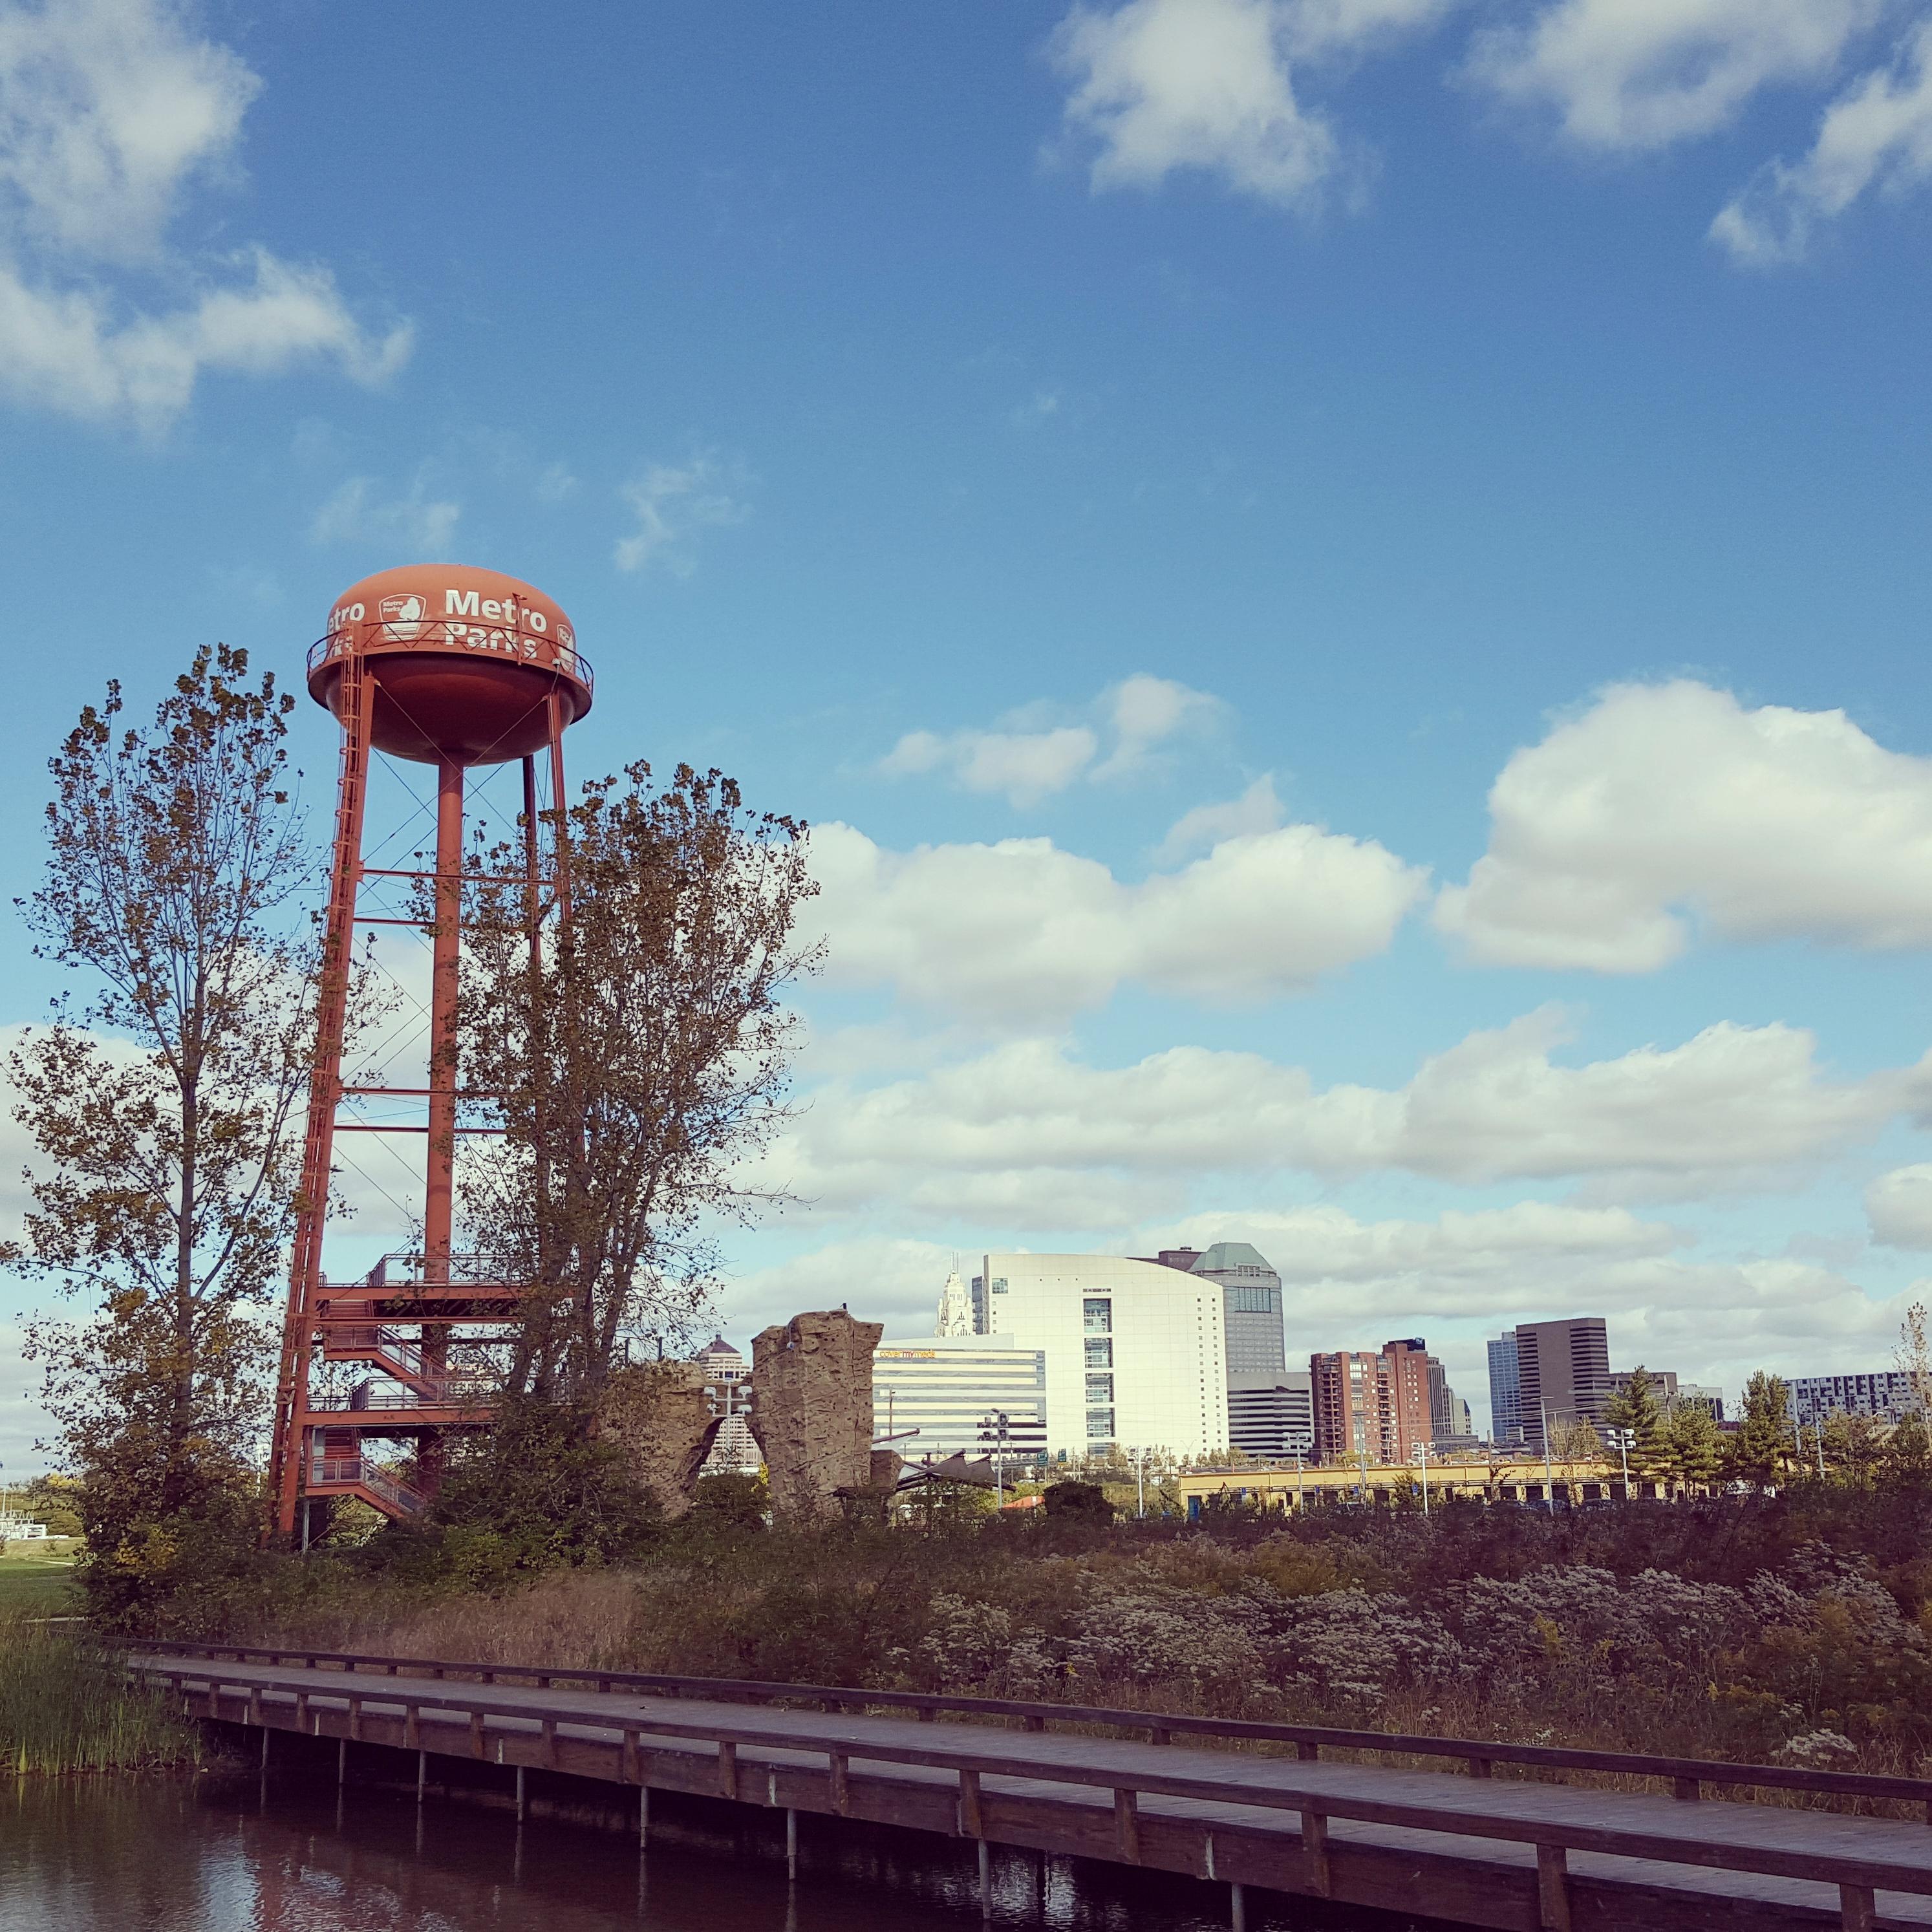 Partial City View